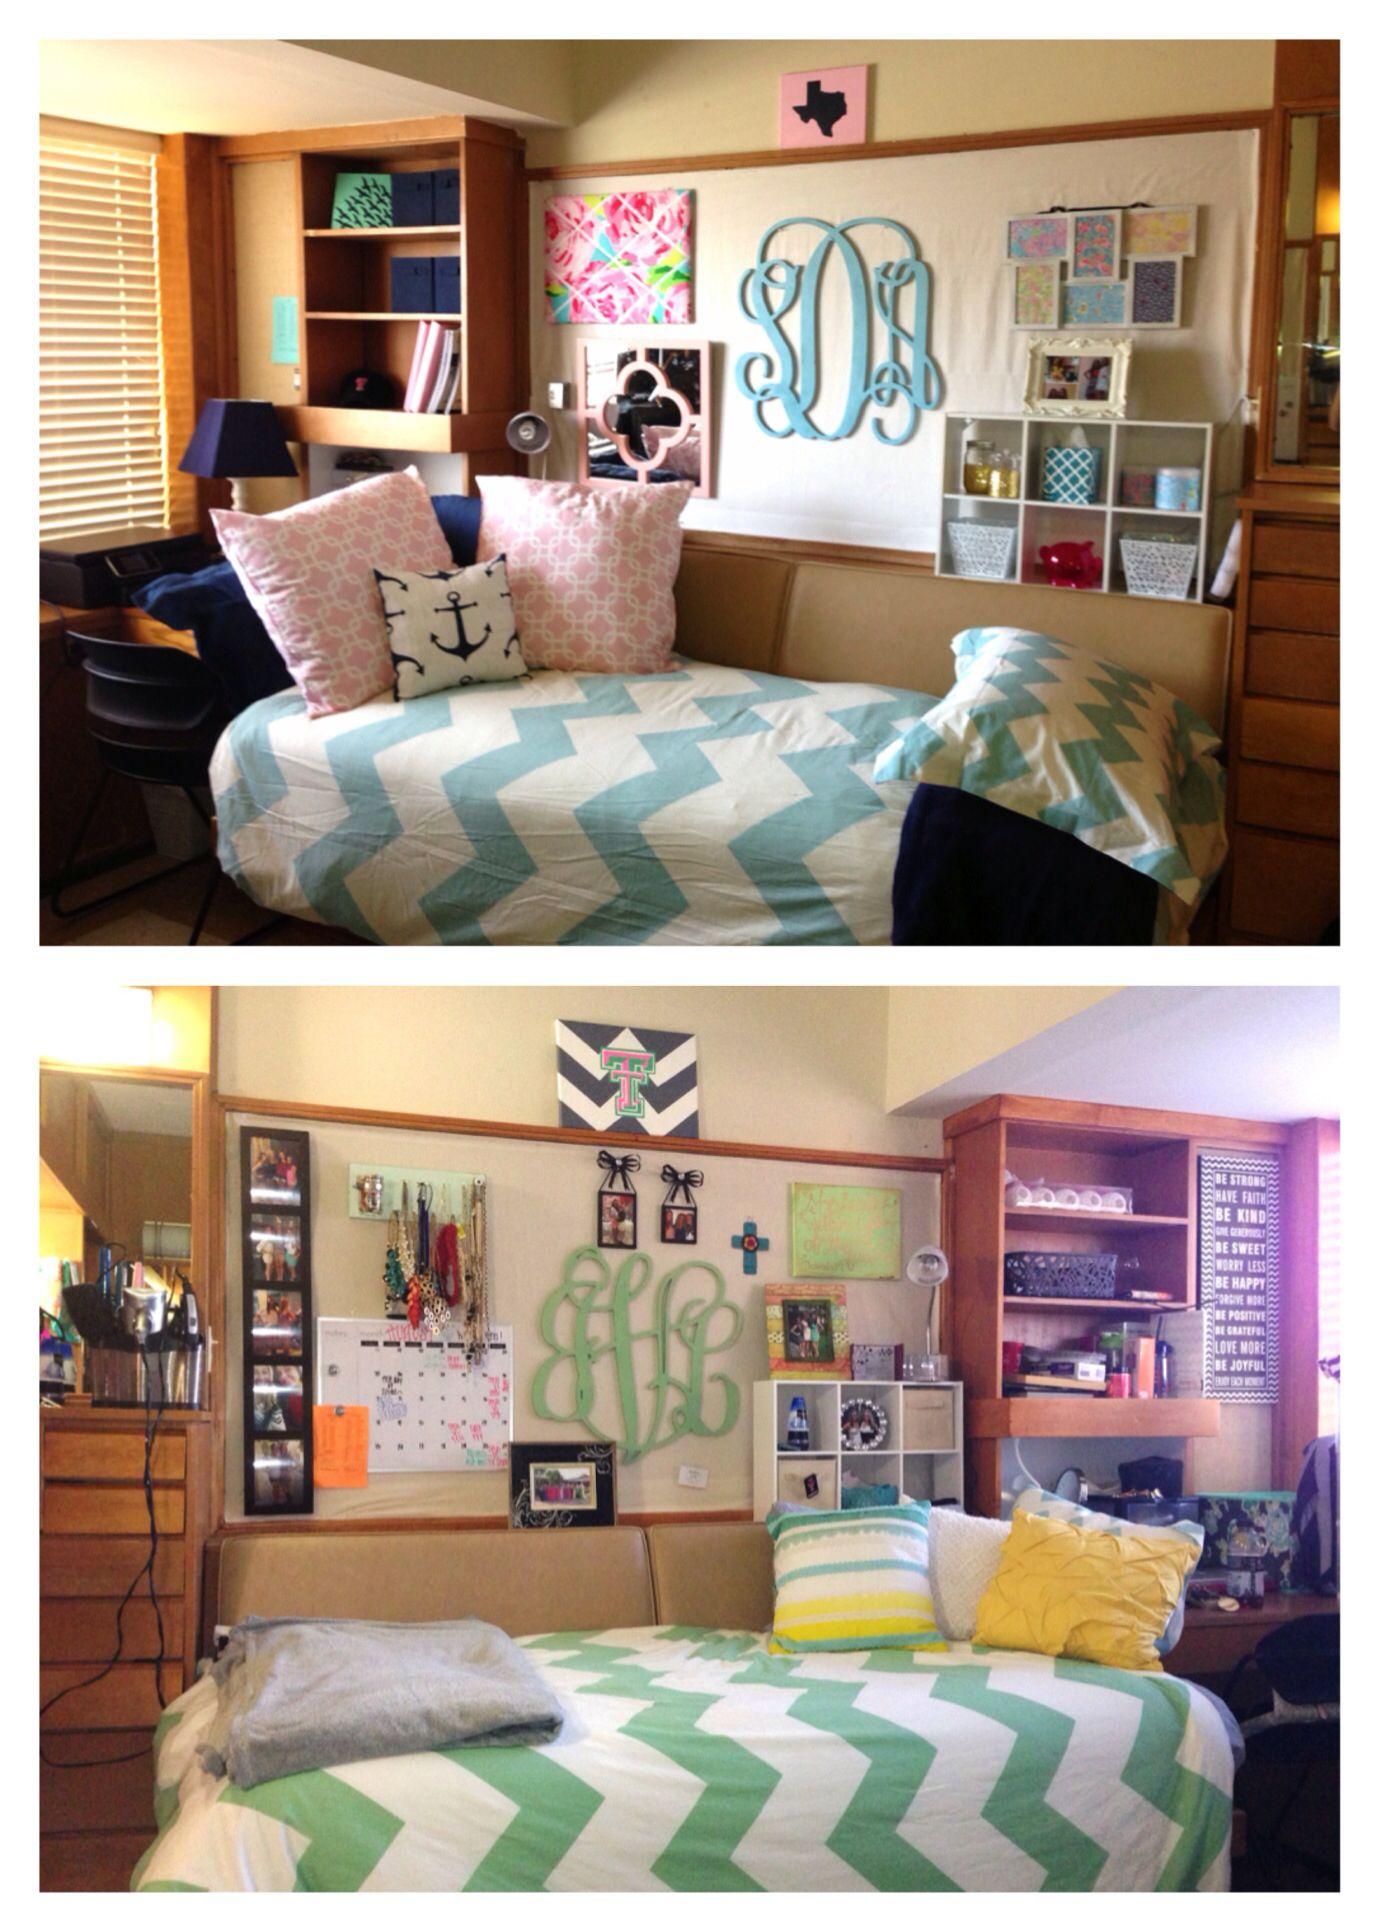 interior design ndsu - 1000+ images about NDSU fall 2015✌ on Pinterest Dorm room ...